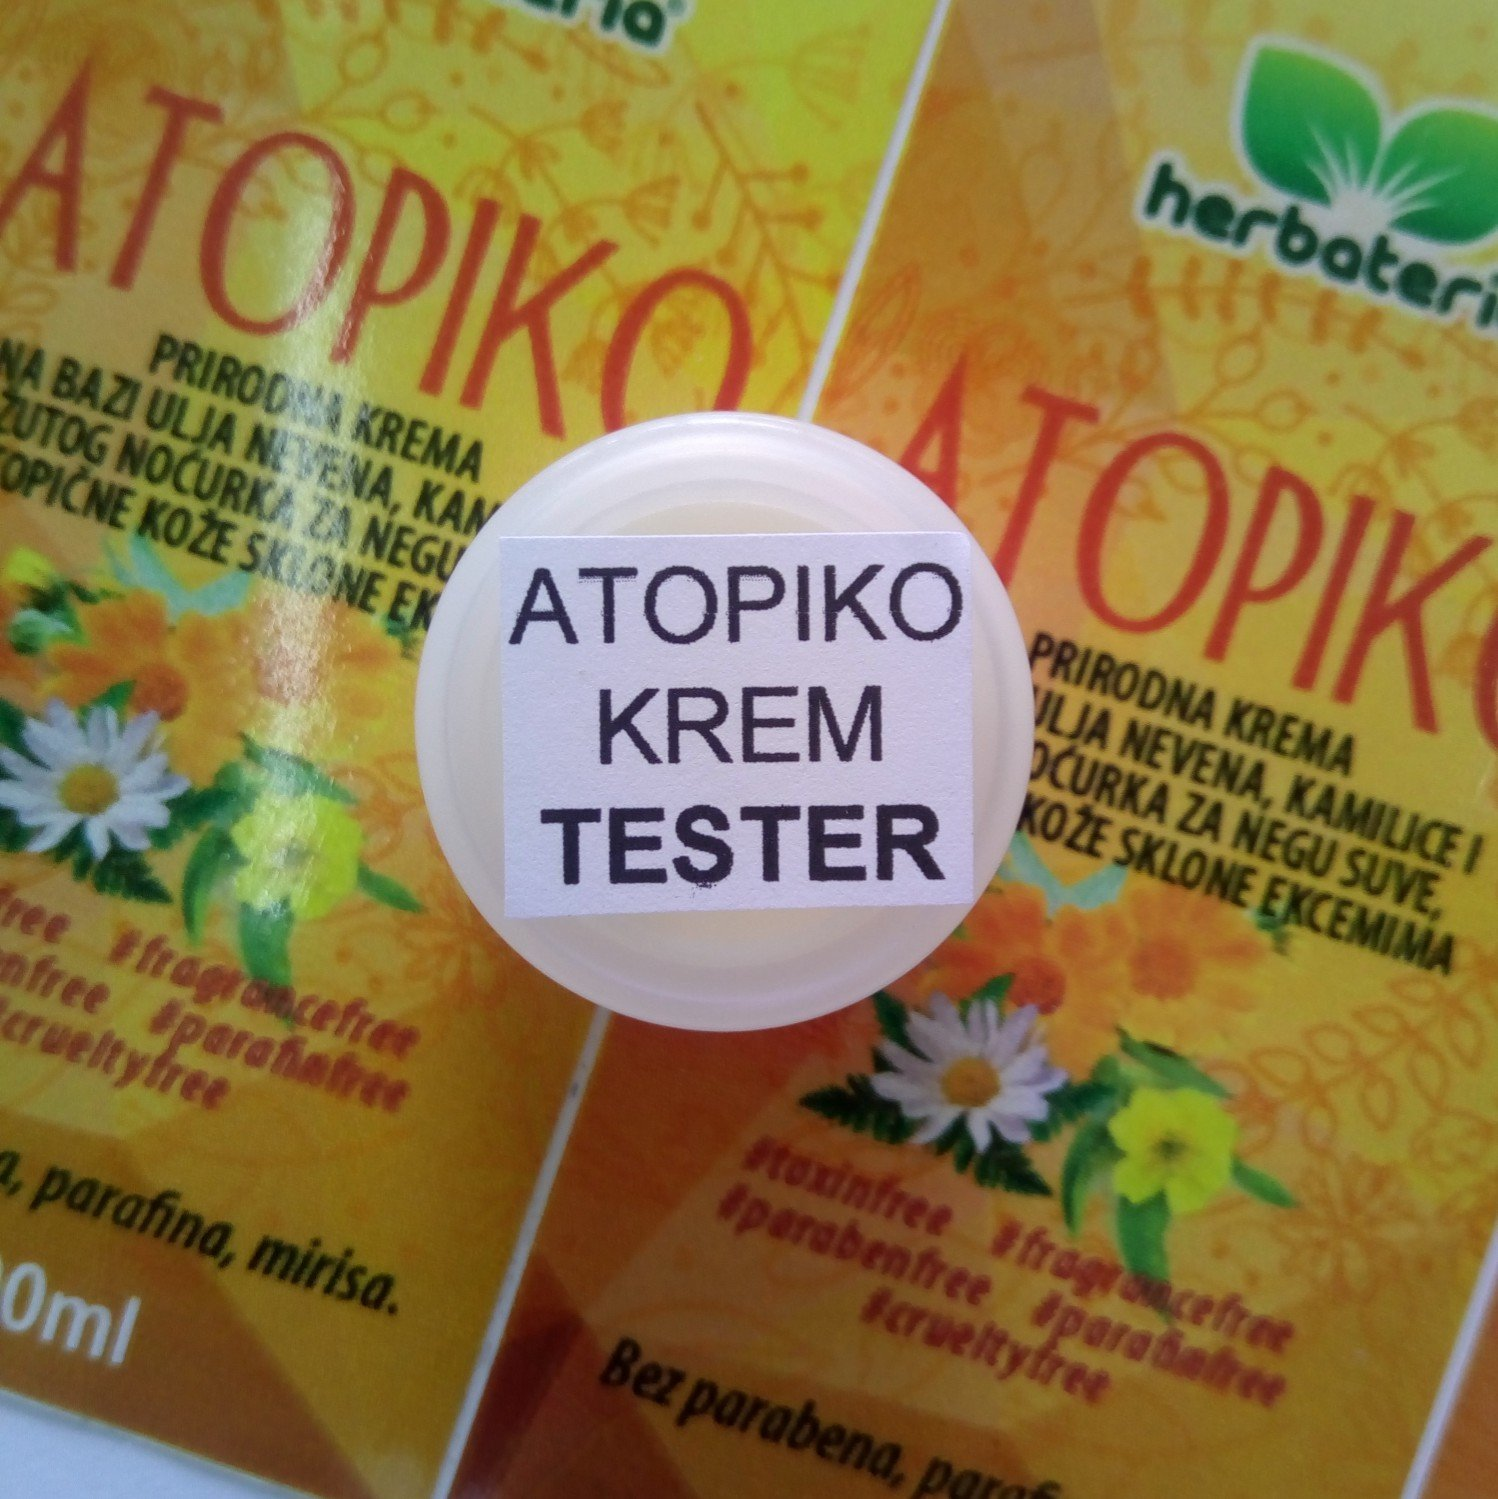 Herbateria - Tester atopiko krem 5 ml